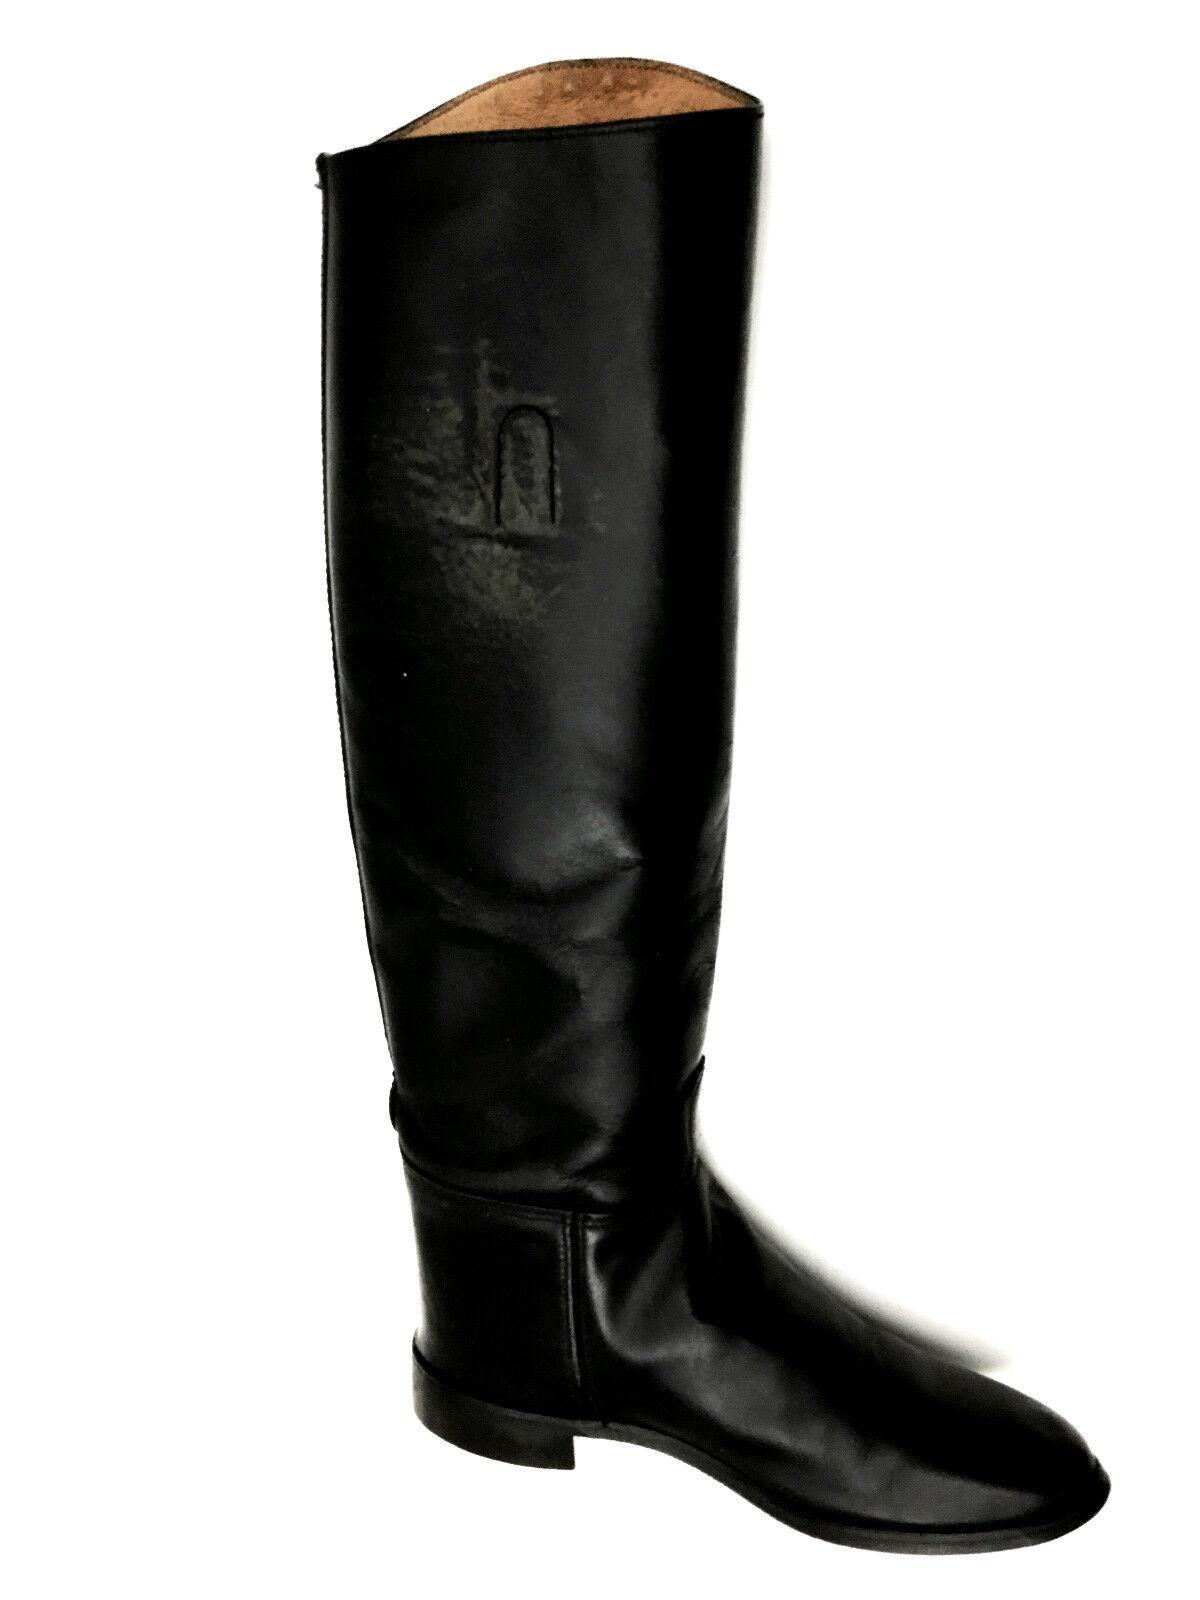 Equestrain RidingLeather Cat's Paw USA Black Boots Size 7 USA Paw dfa4bd